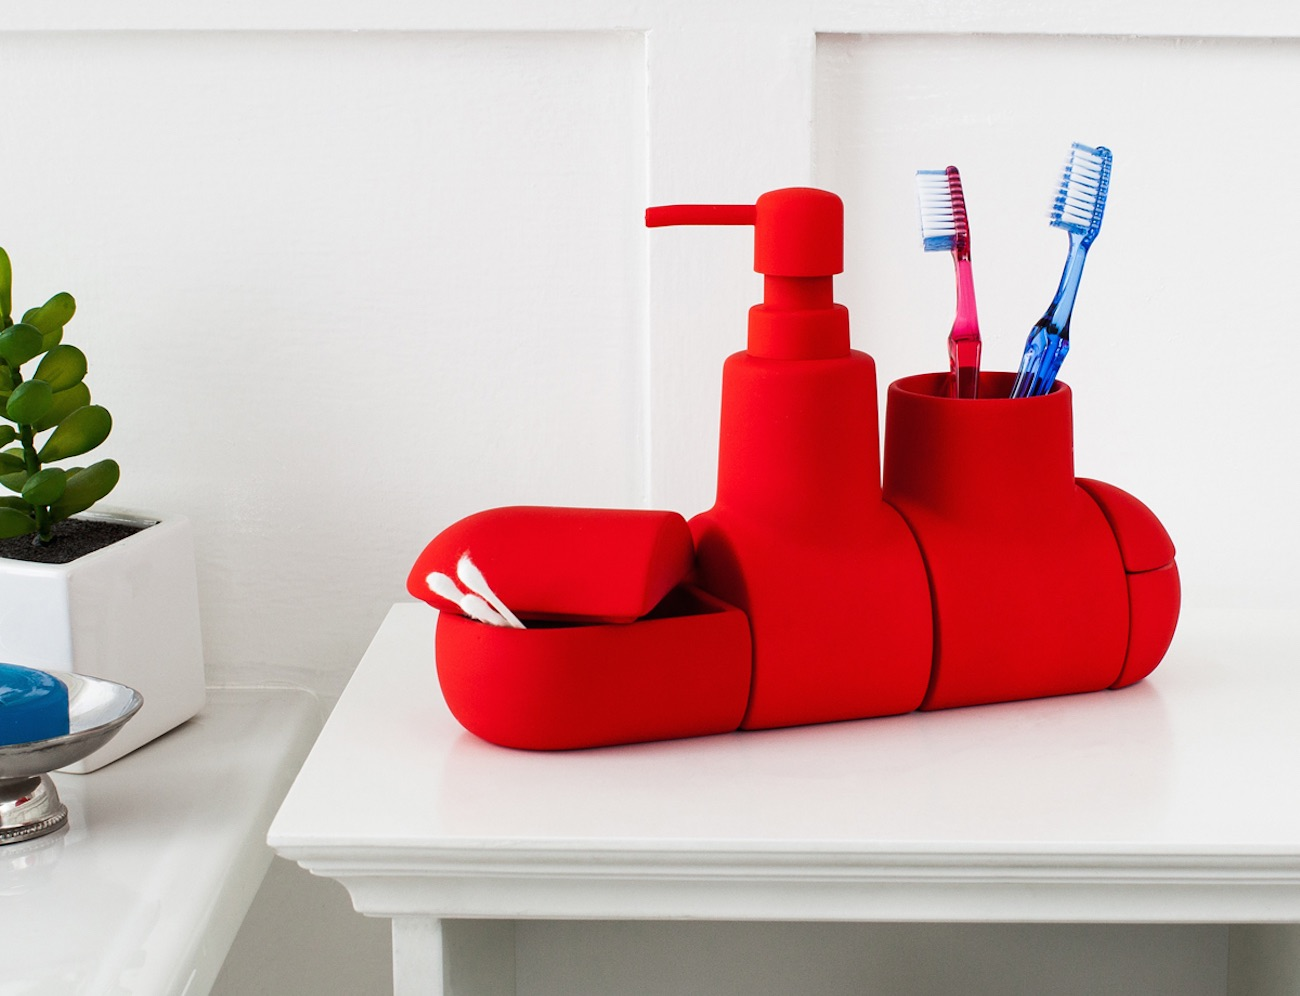 Submarino Bathroom Set by Hector Serrano for Seletti